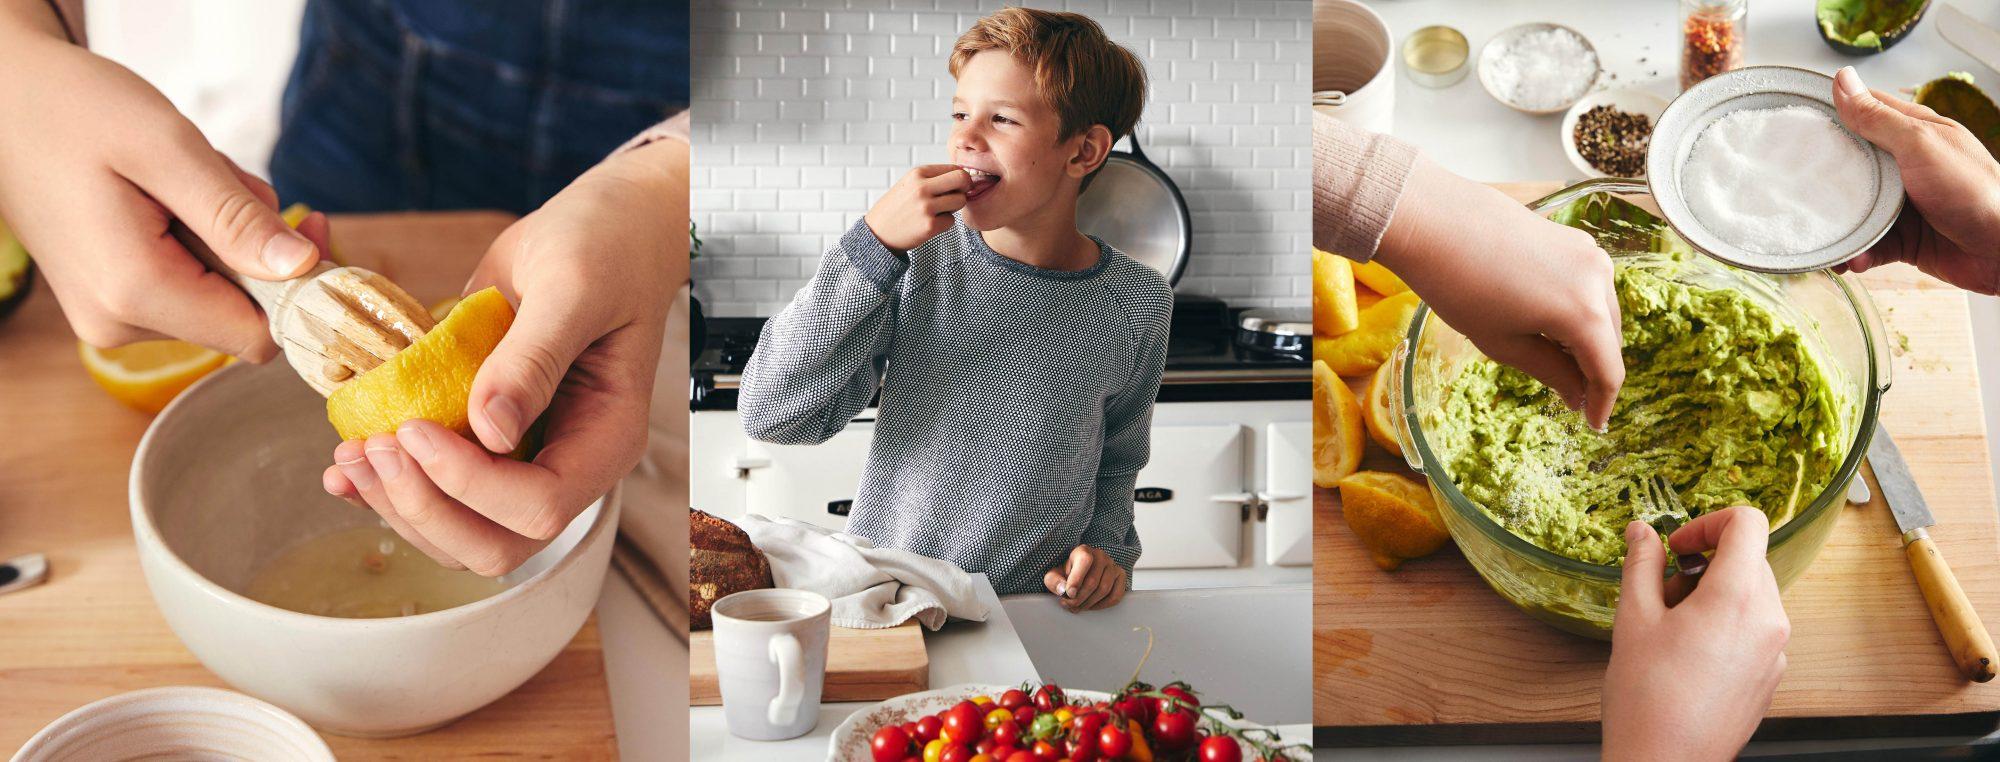 lemon juicing kid with tomato guac mash